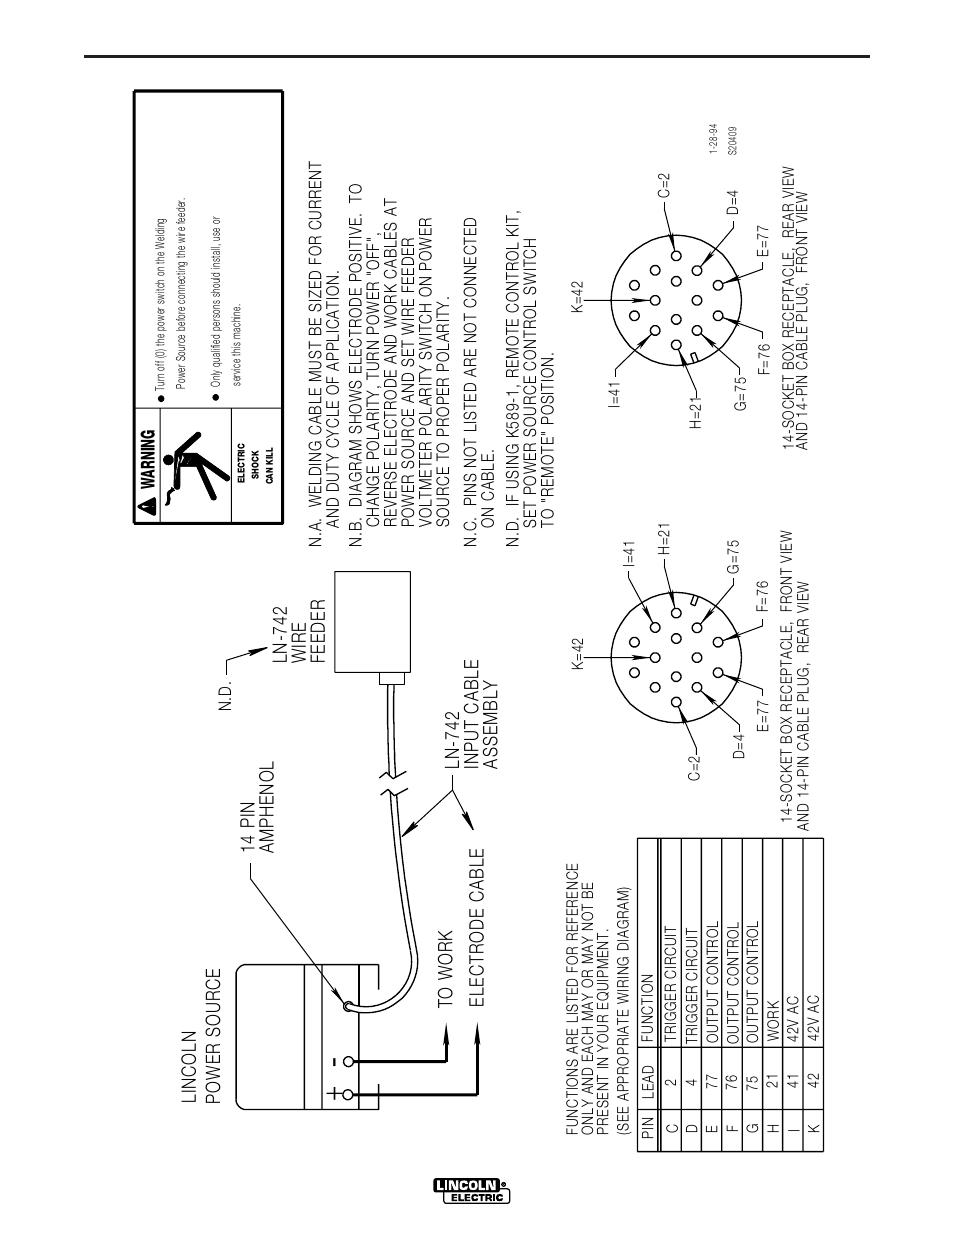 Diagrams, Lincoln power source to an ln-742, Cv-400-i